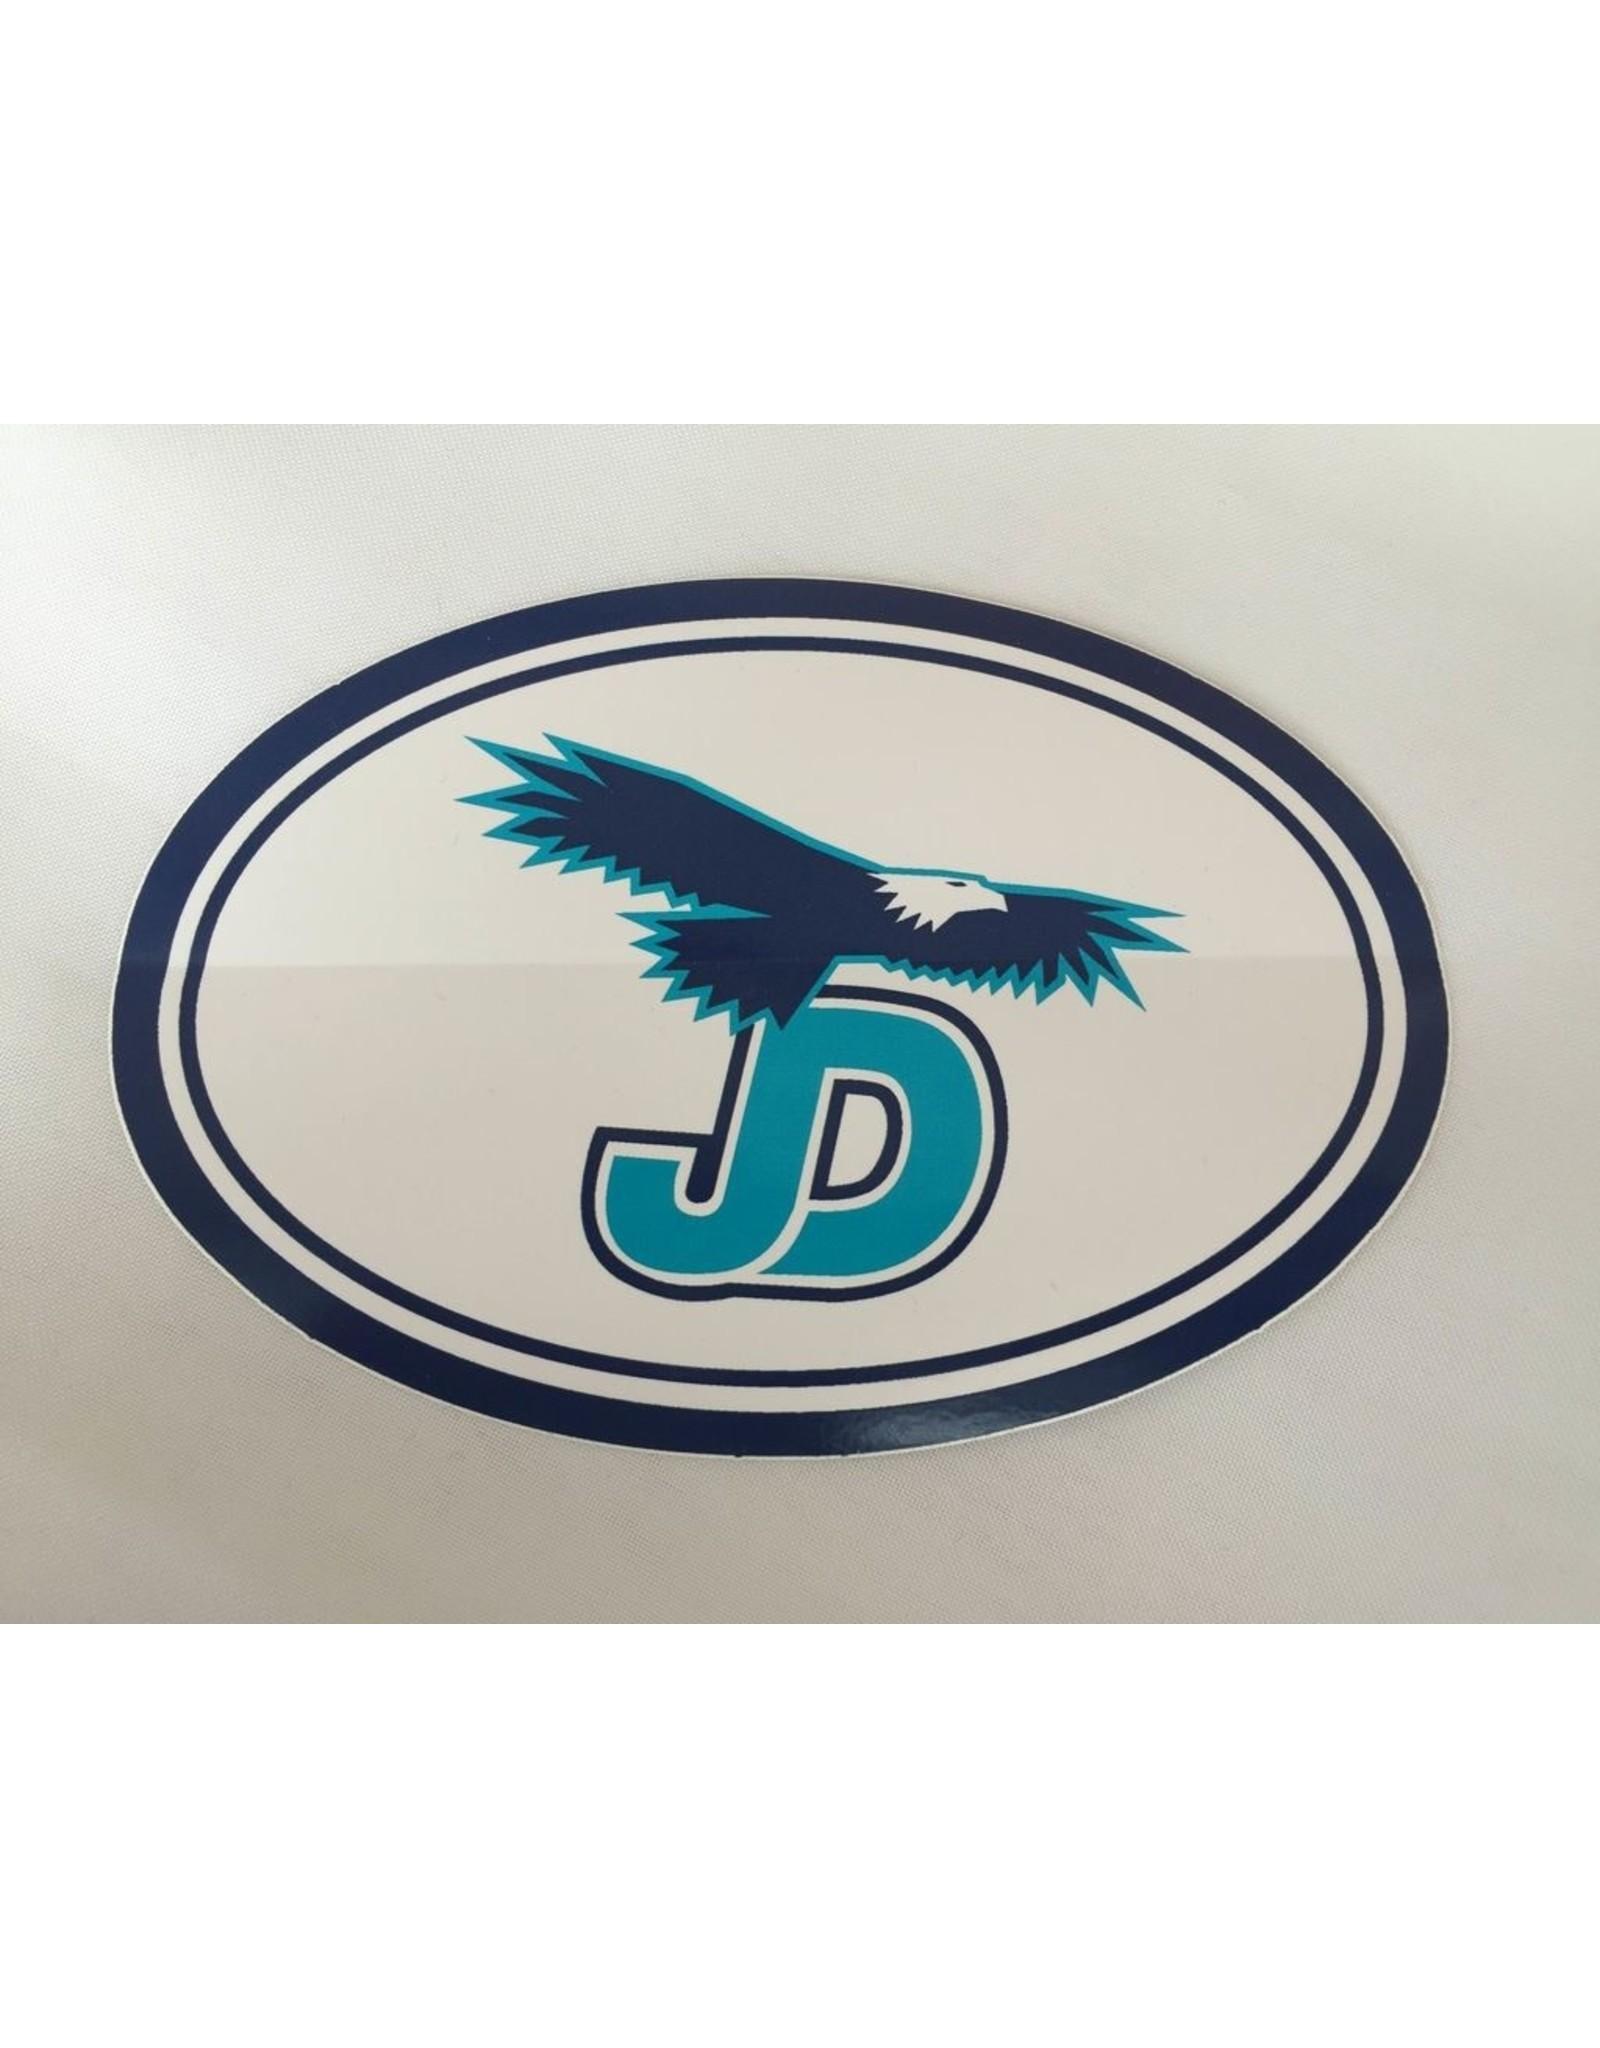 "NON-UNIFORM JD Sticker - 4""x6"" oval, white decal"